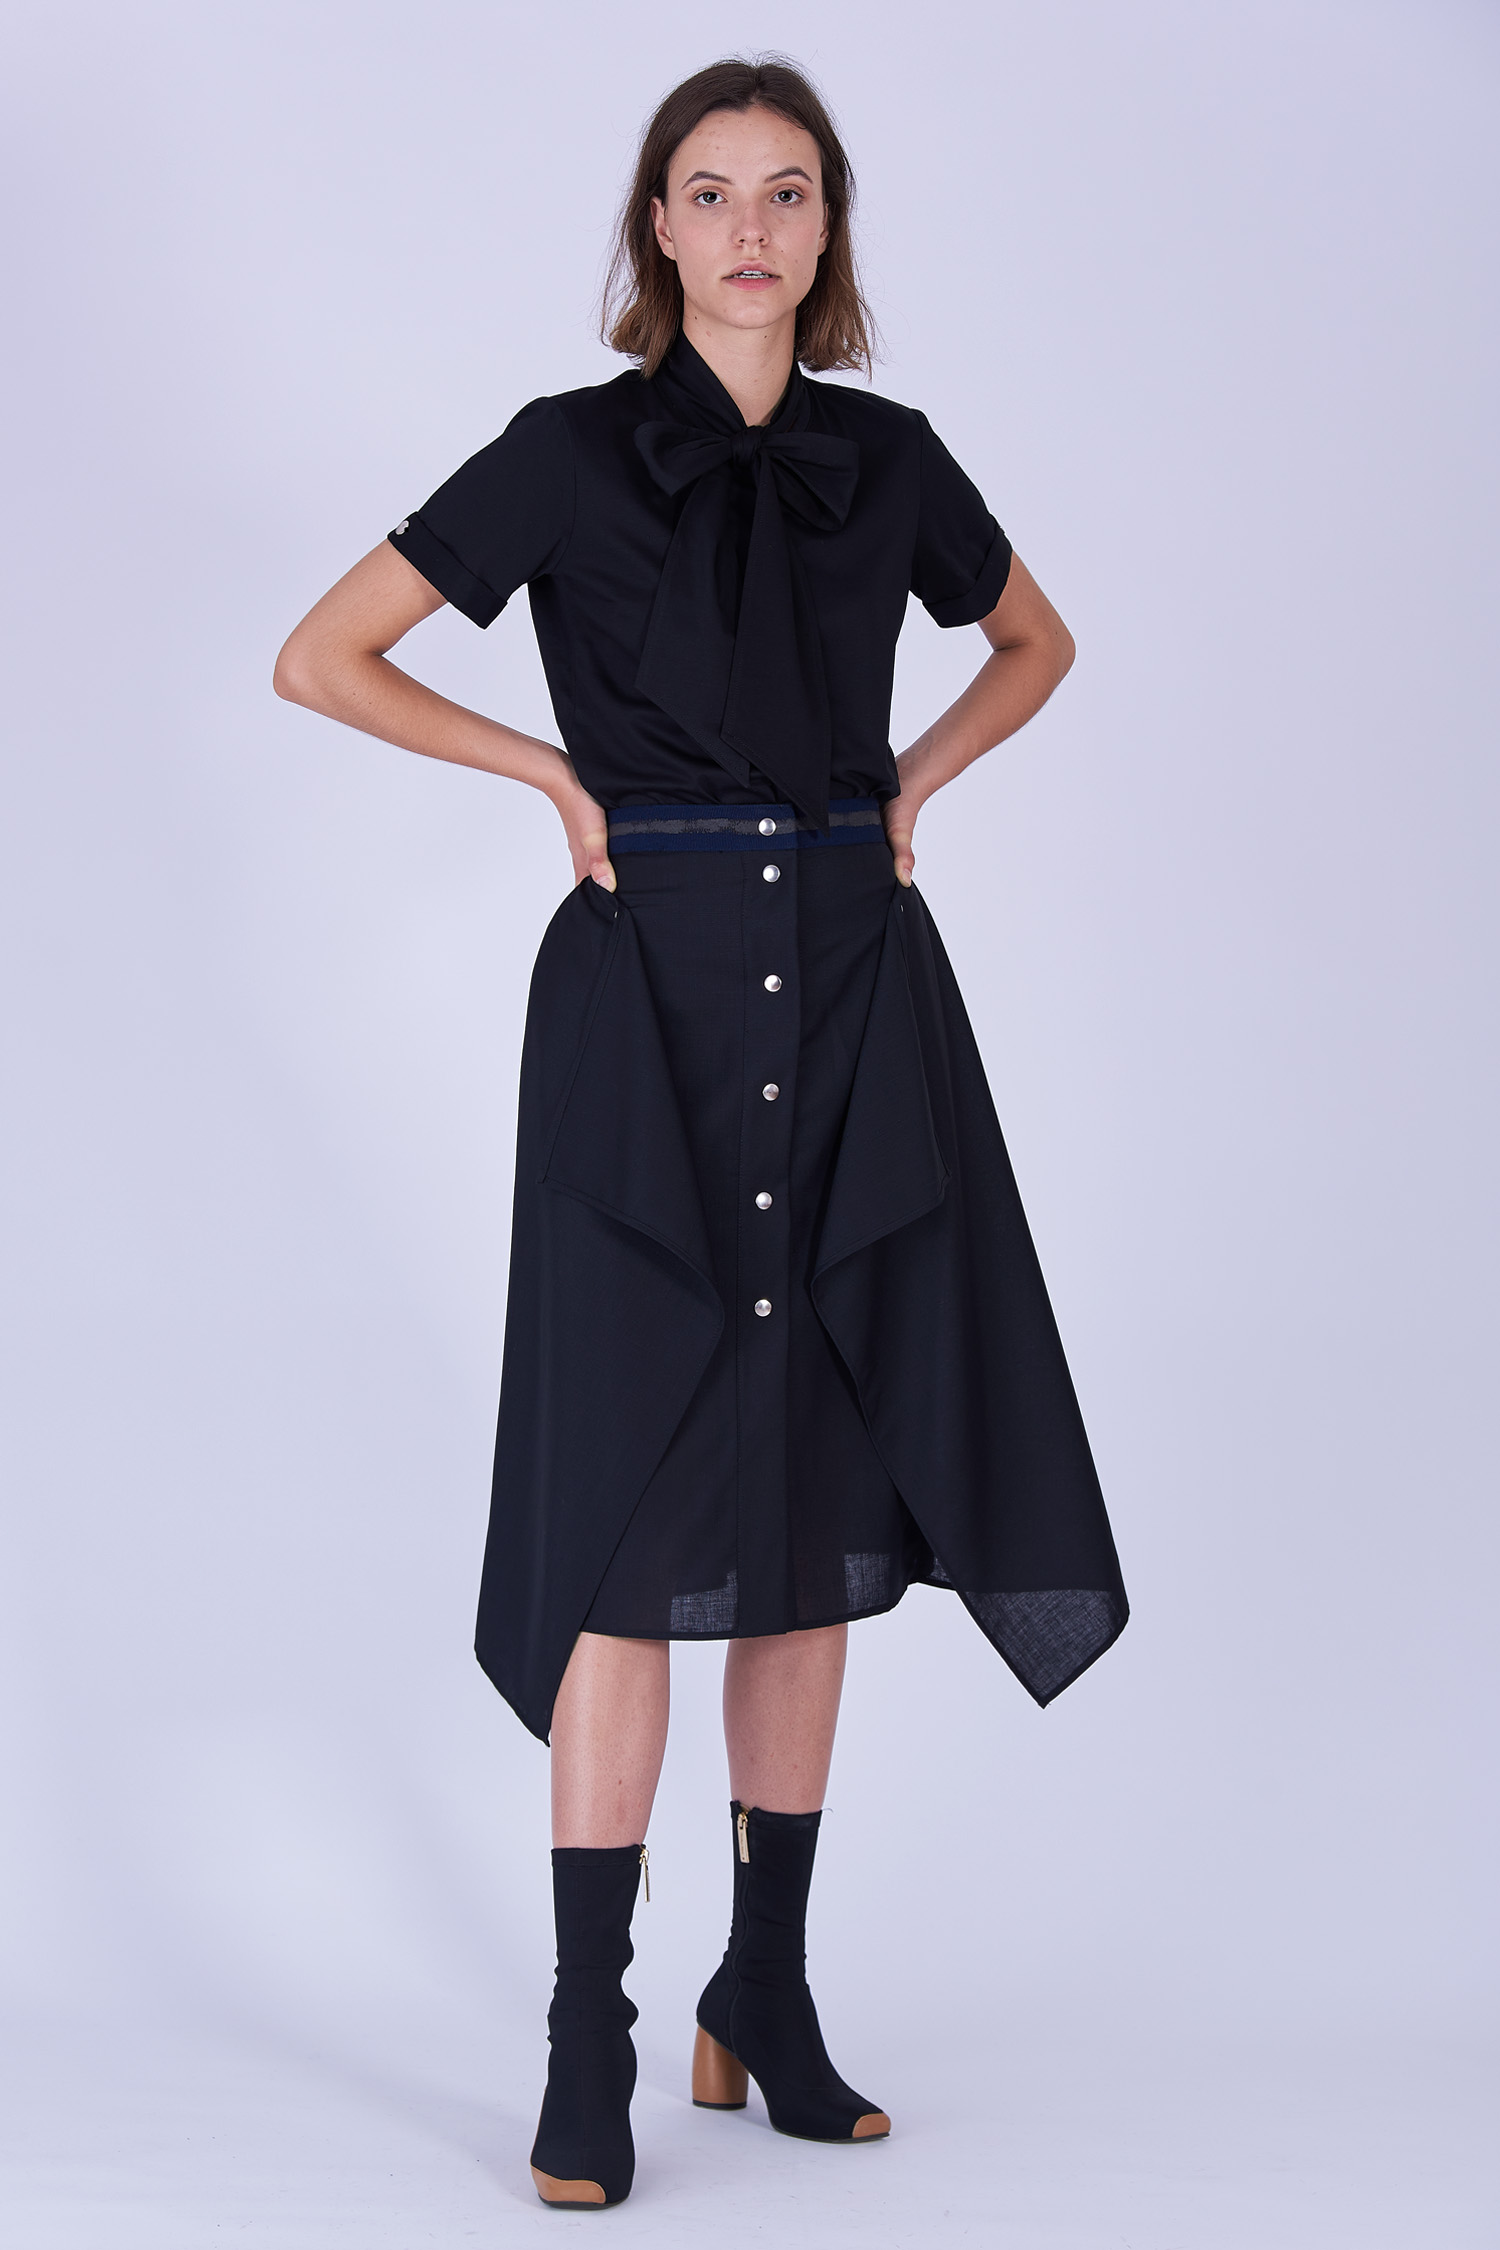 Acephala Fw19 20 Black Skirt Draped Czarna Spodnica Drapowana Front 3